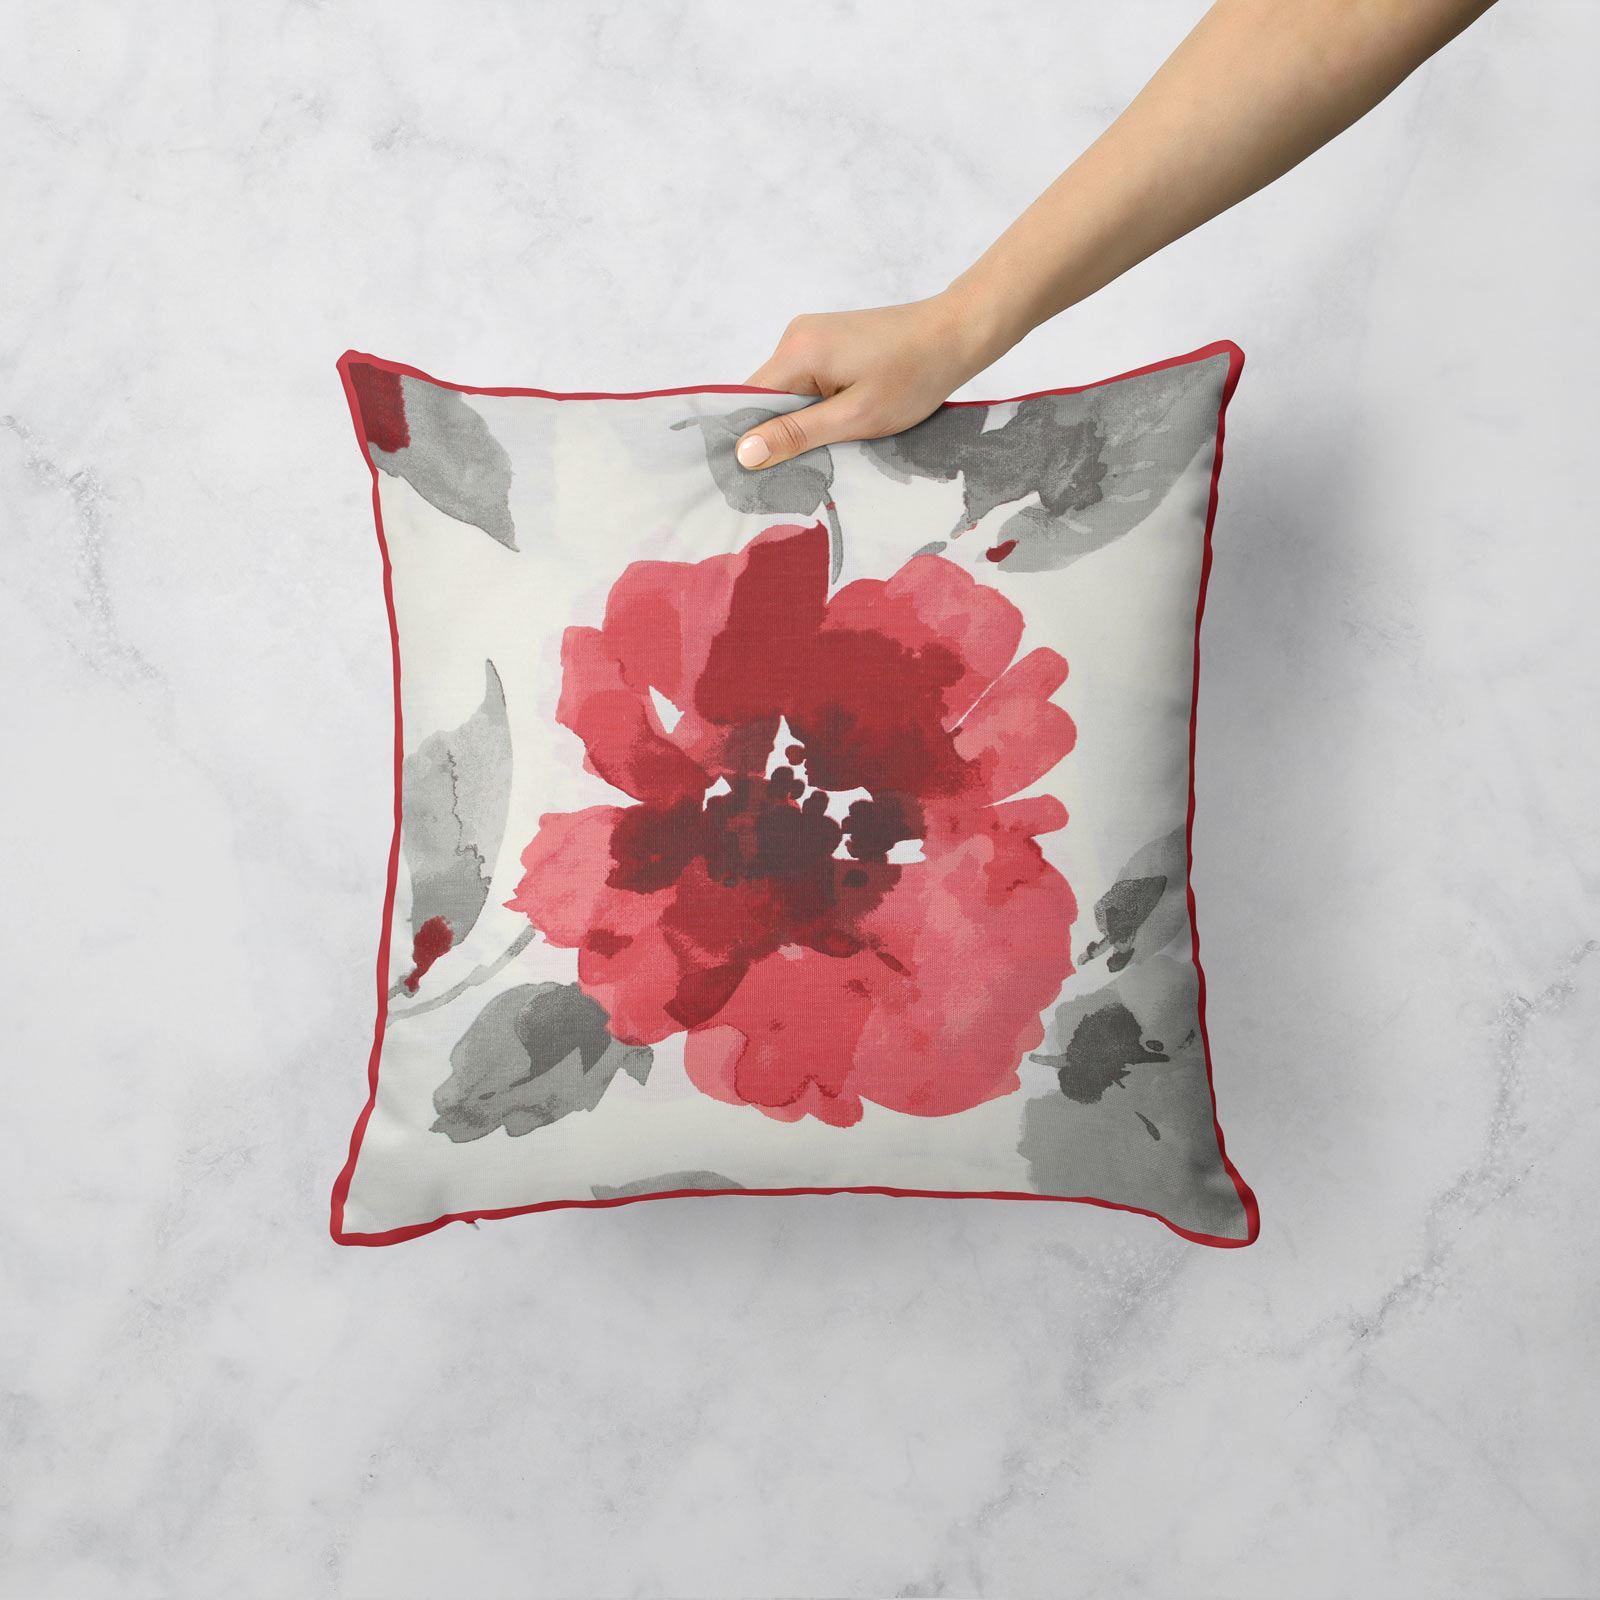 Vino-Tinto-Cushion-Covers-Coleccion-17-034-18-034-43cm-45cm-Cubierta miniatura 12